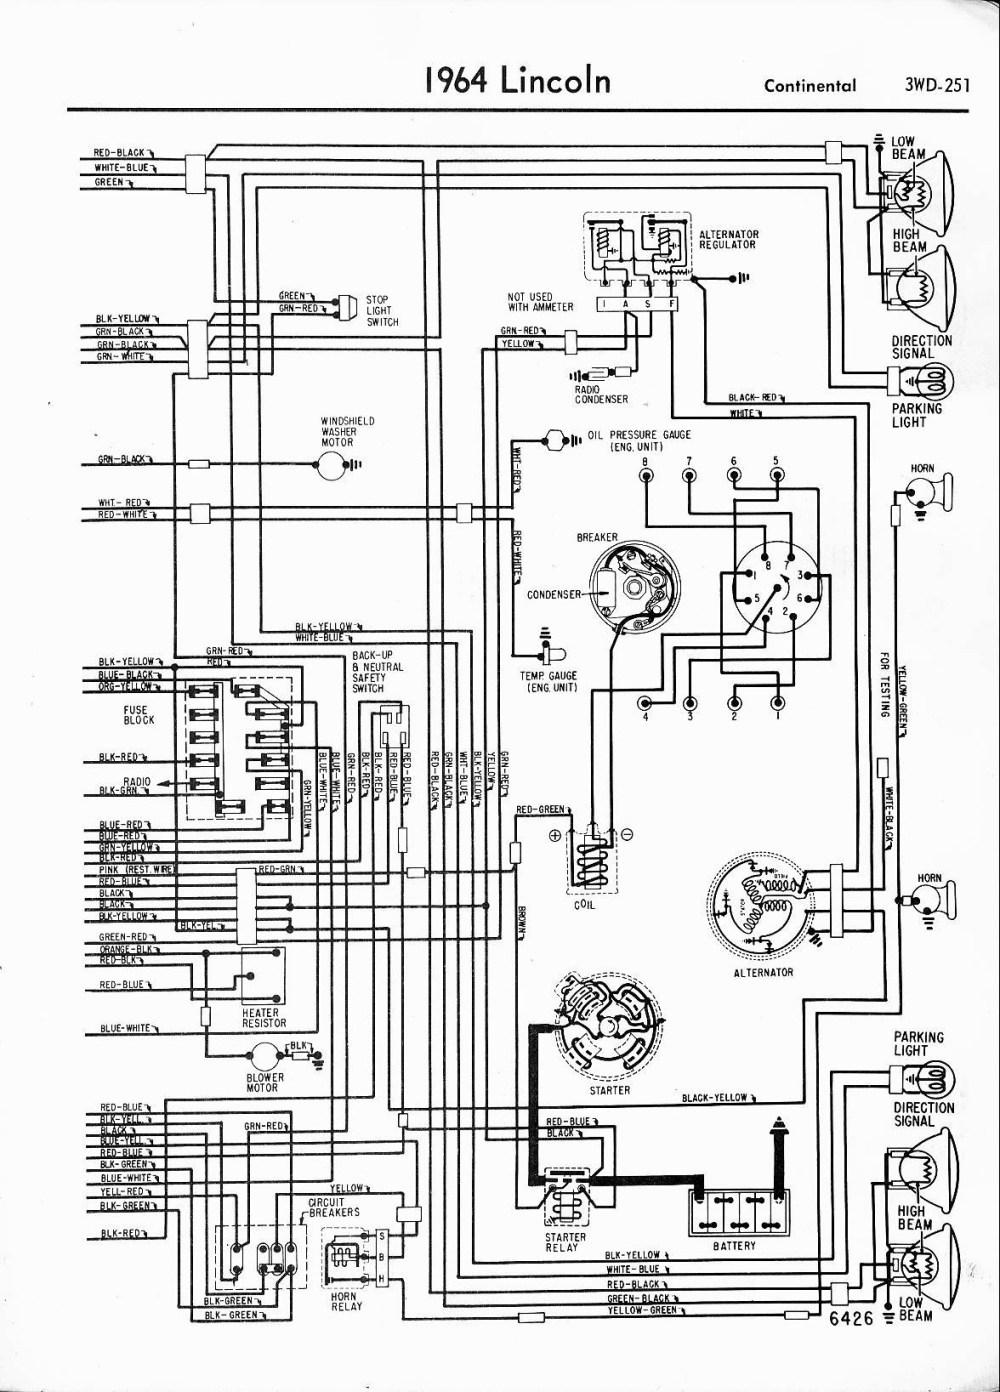 medium resolution of 68 lincoln continental fuse box schematic wiring diagrams u2022 rh arcomics co 1998 lincoln navigator wiring